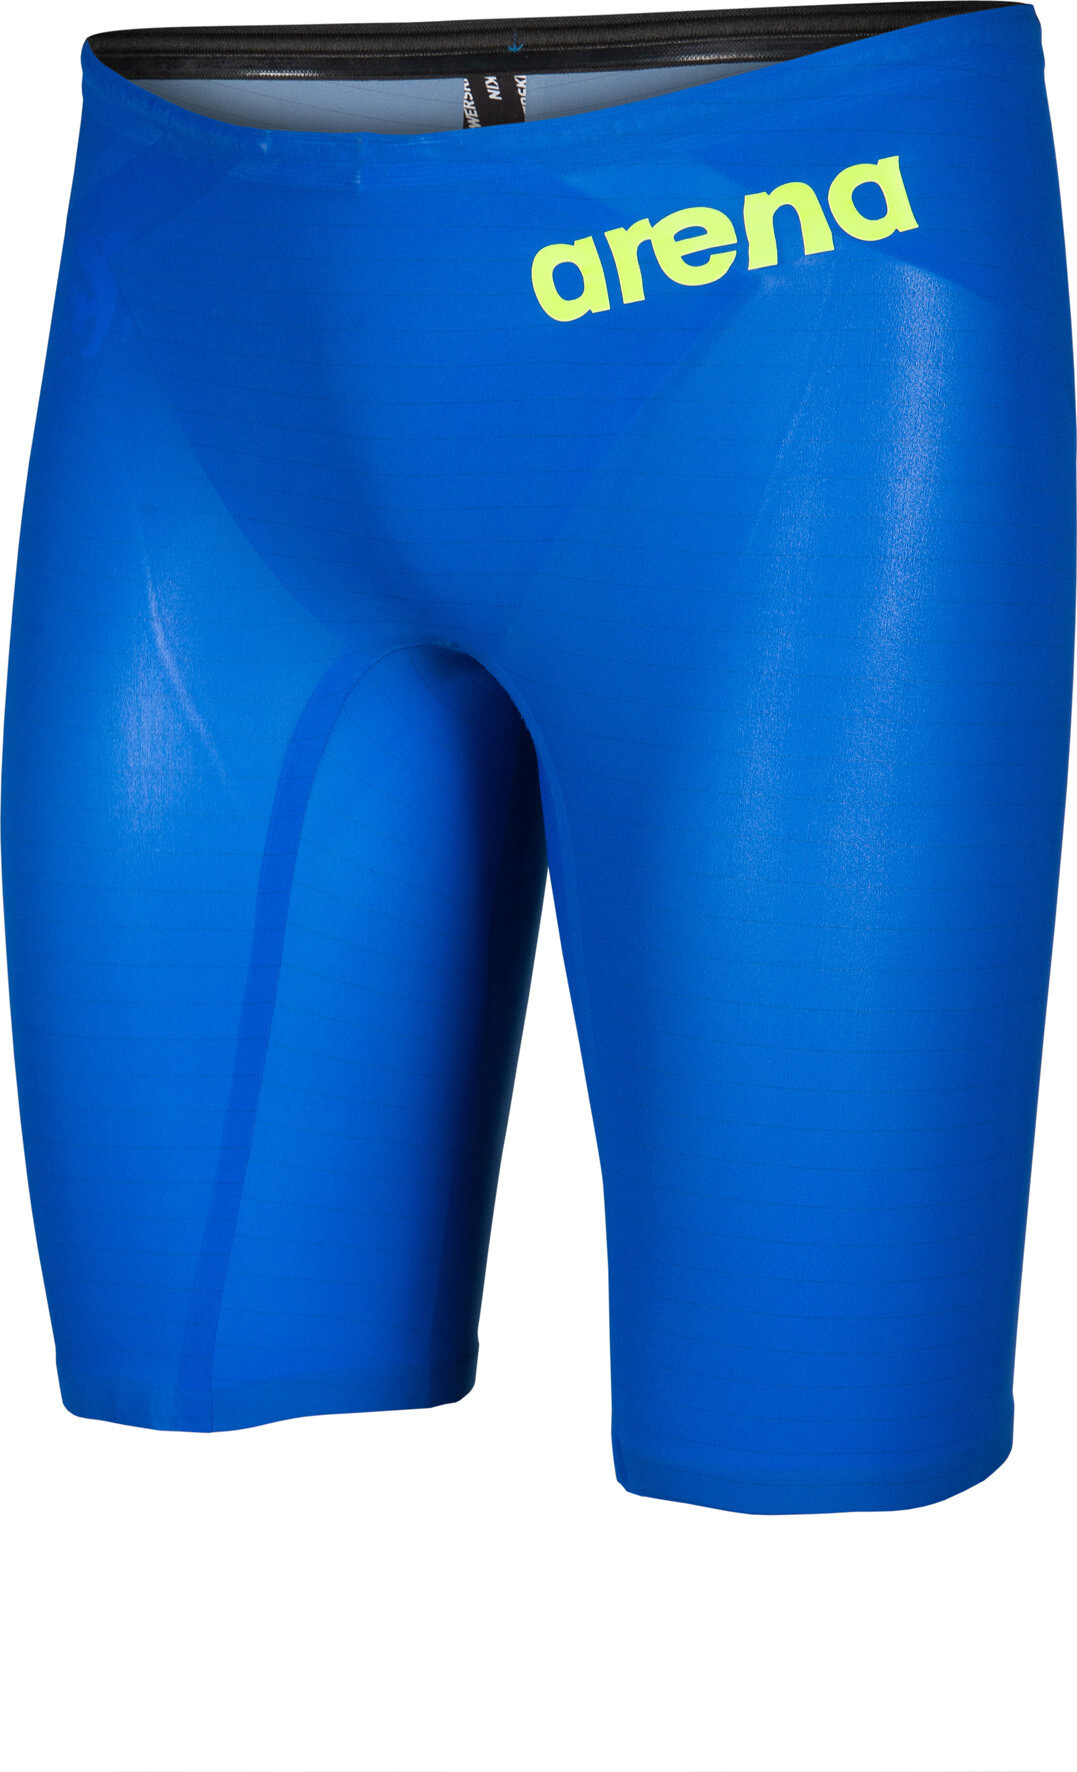 4cc881a8a2d44d arena Powerskin Carbon Air 2 zwembroek Heren, electric blue/dark grey/fluo  yellow